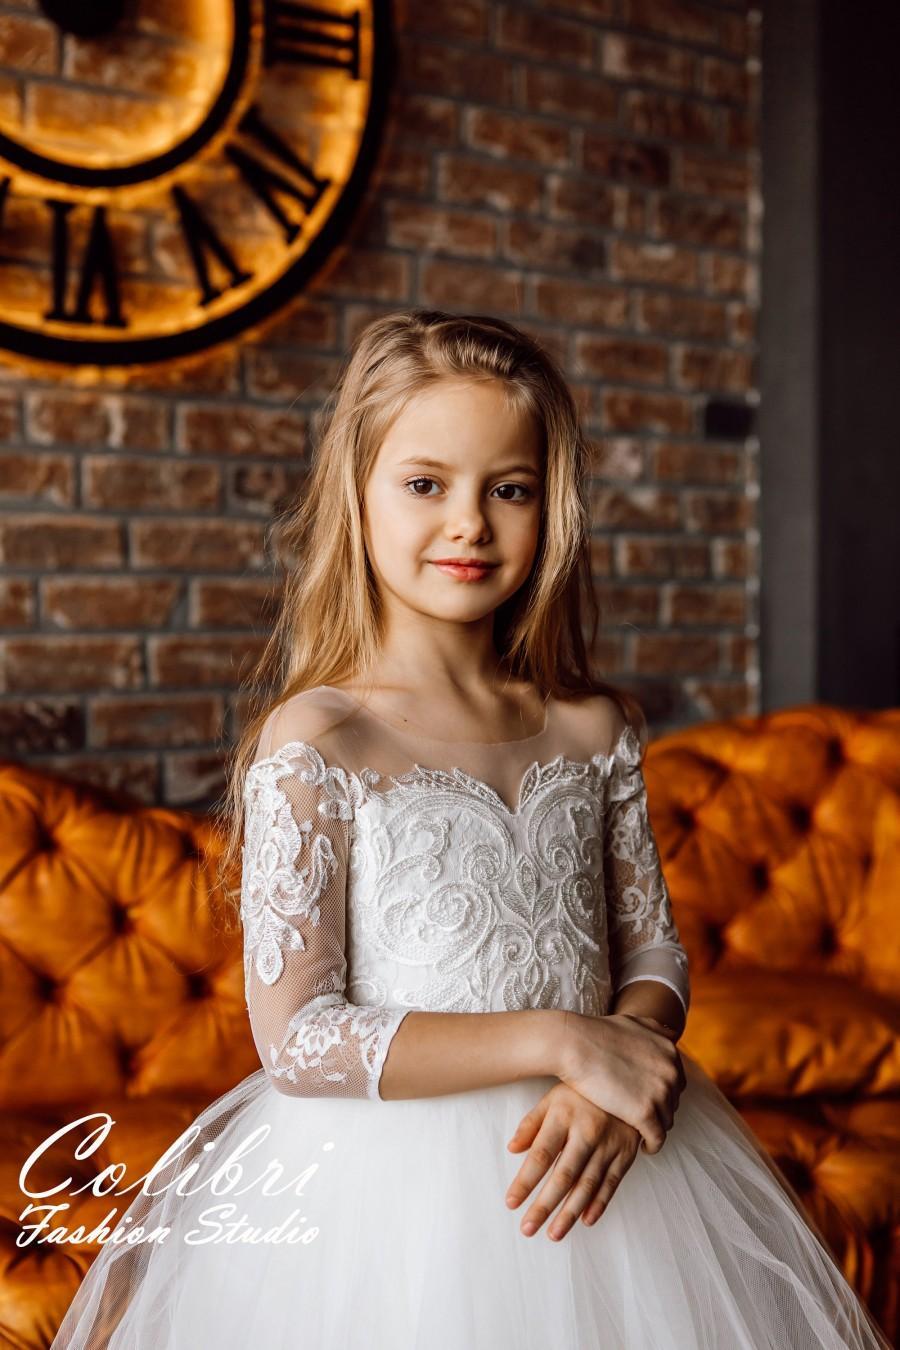 Wedding - Flower girl dress, Communion dress, Flower girl dress tulle, Flower girl dress long sleeve, Lace flower girl dress,  Wedding girl dress